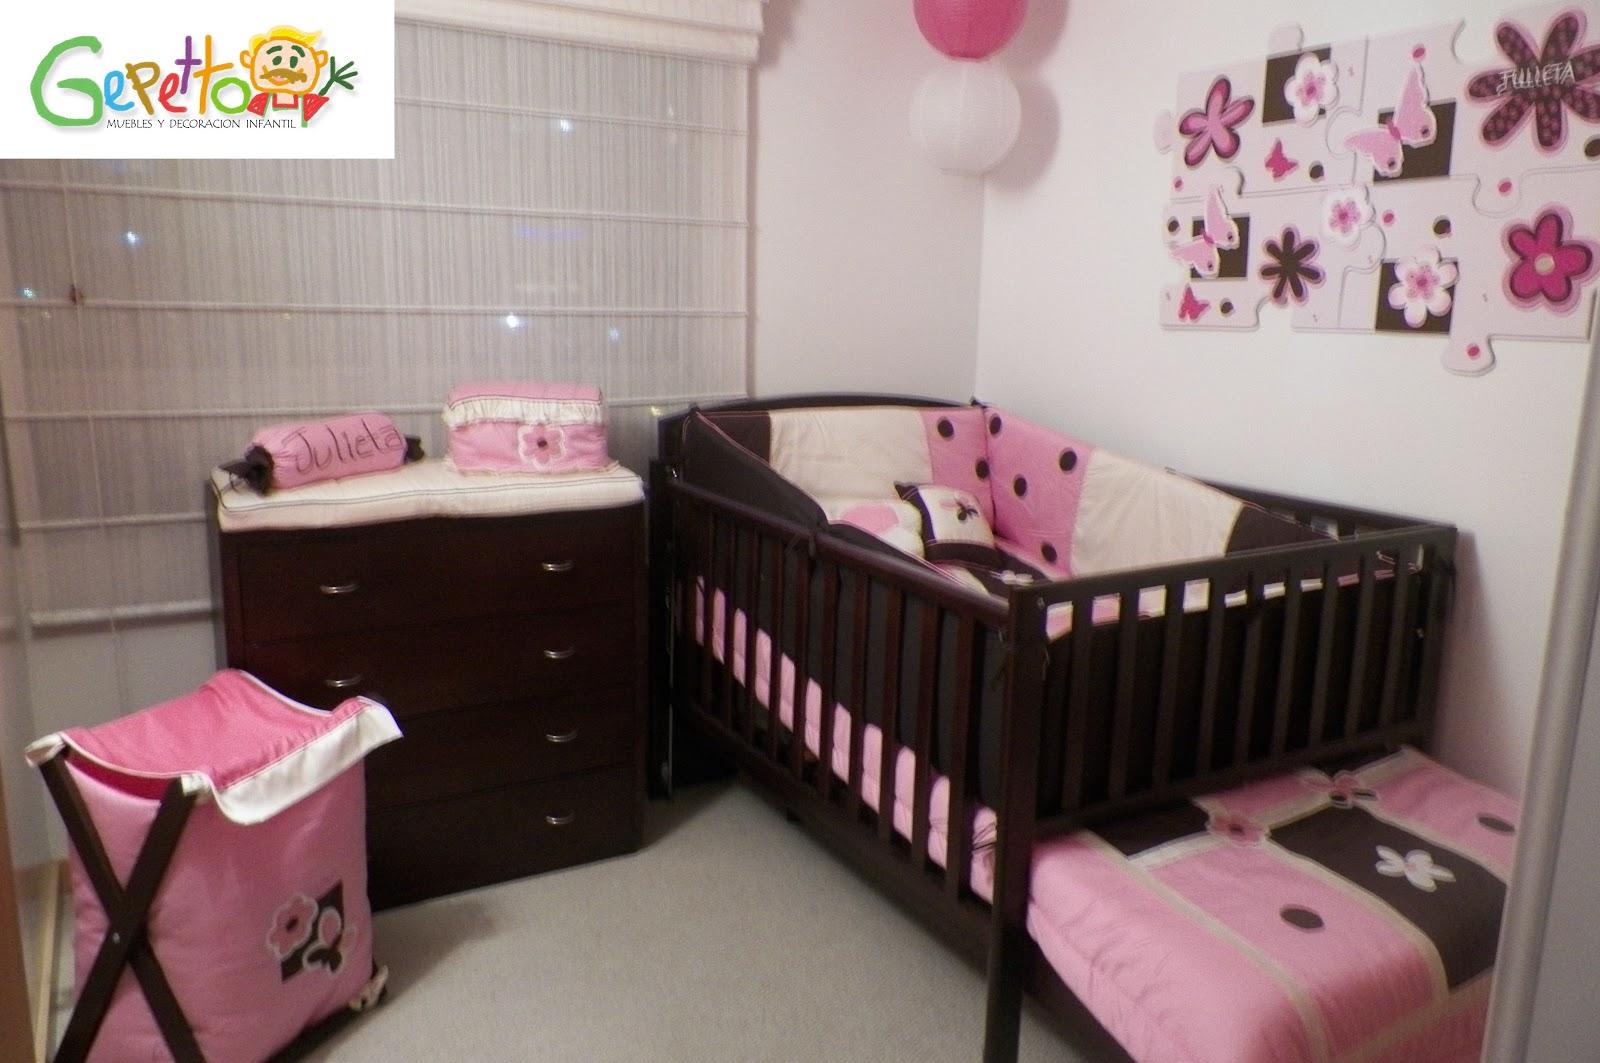 Fabricas De Cama Cunas En Bogot Imagui # Muebles Infantiles Bogota